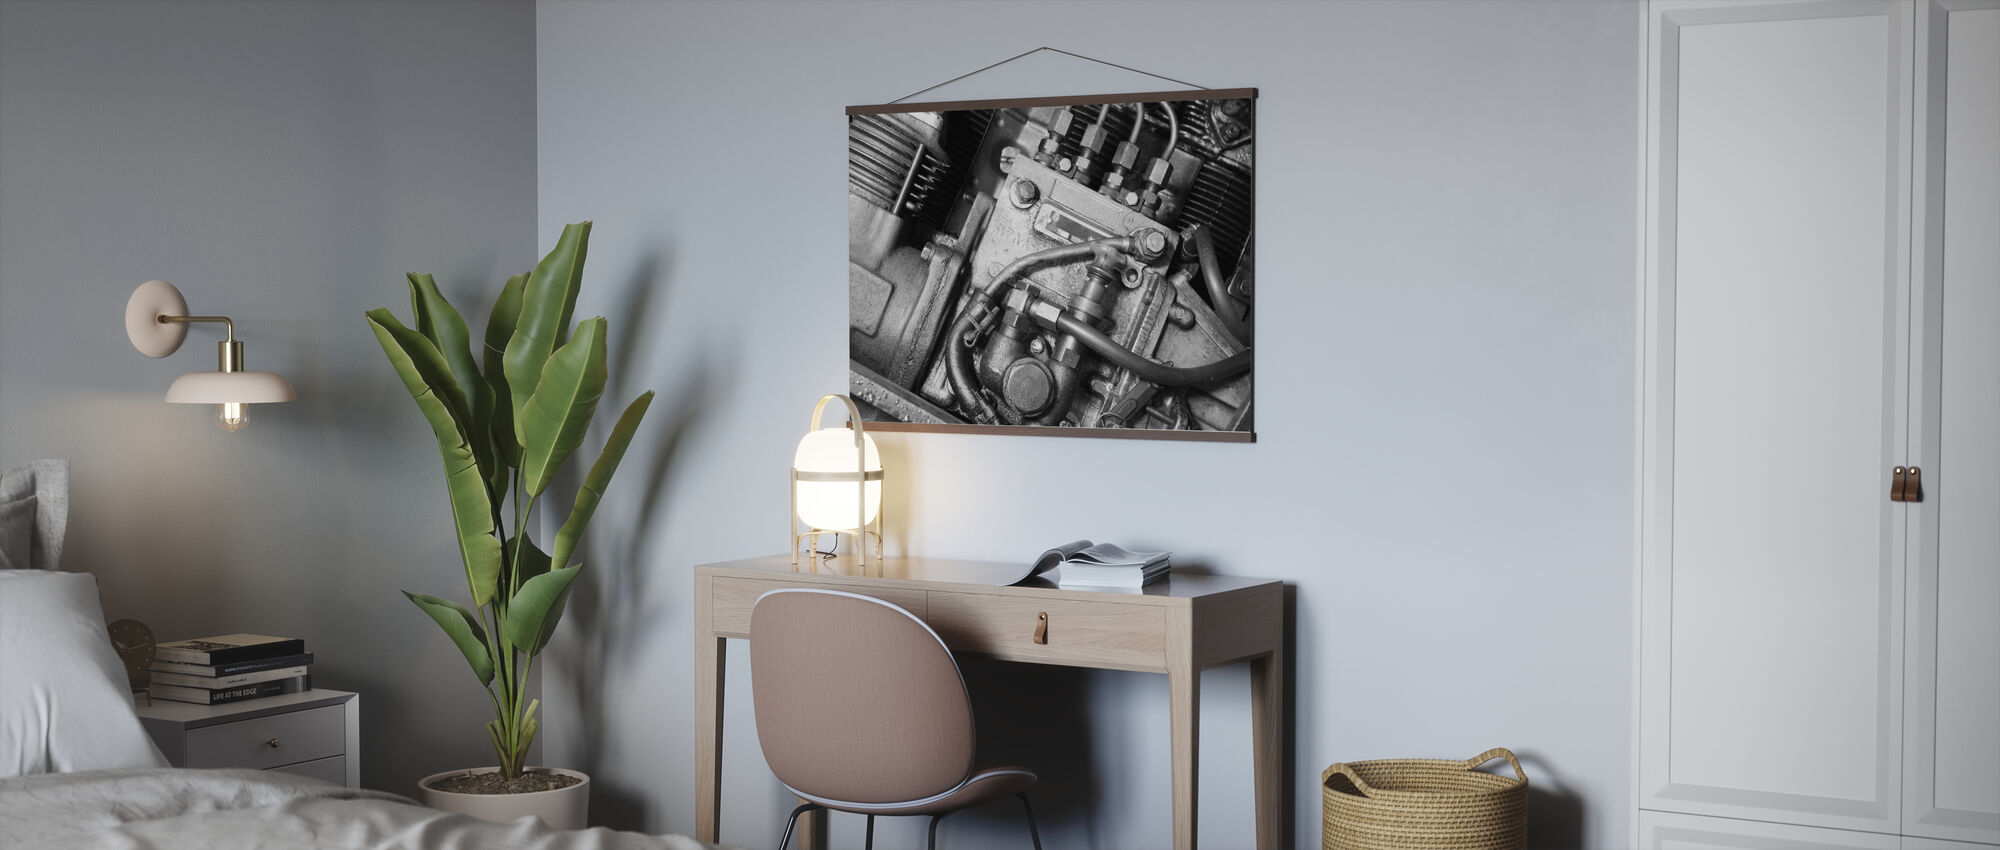 Car Engine - Monochrome - Poster - Office